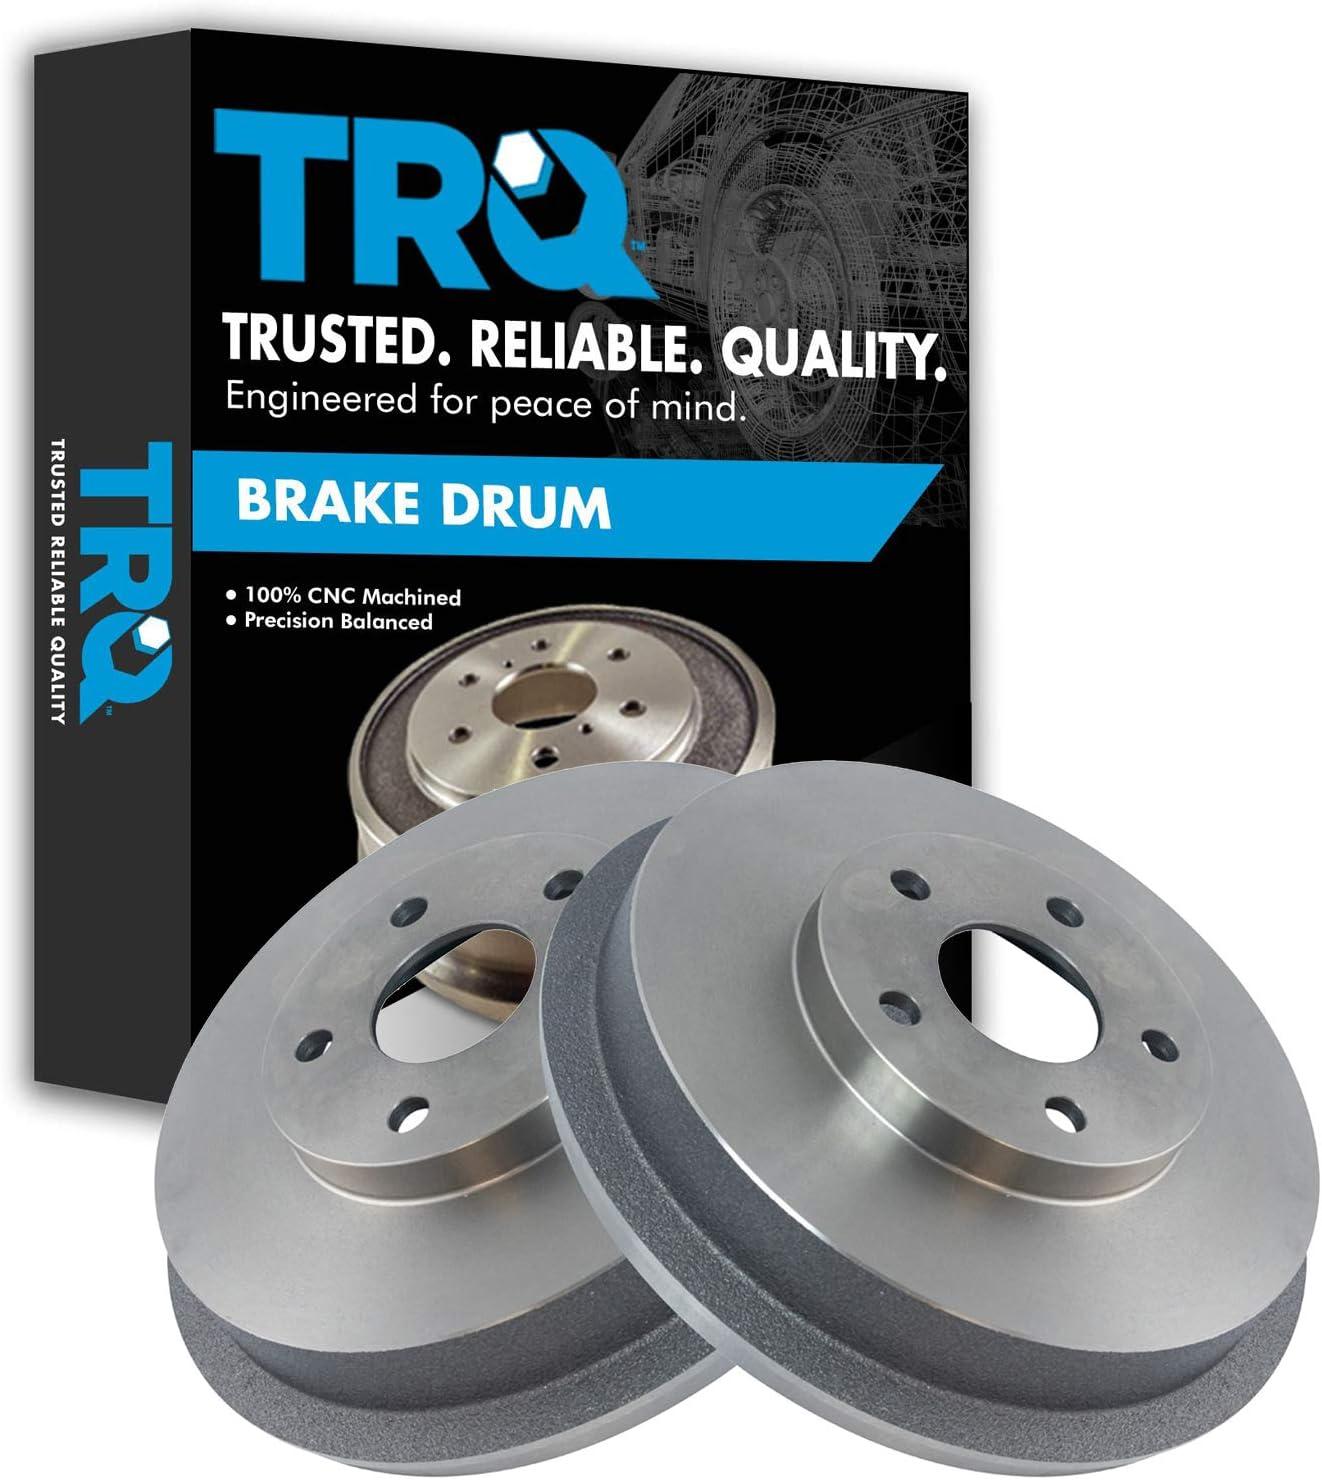 TRQ Rear Brake Drum Pair Set 199 for Trust Subaru Forester Max 53% OFF 1998-2008